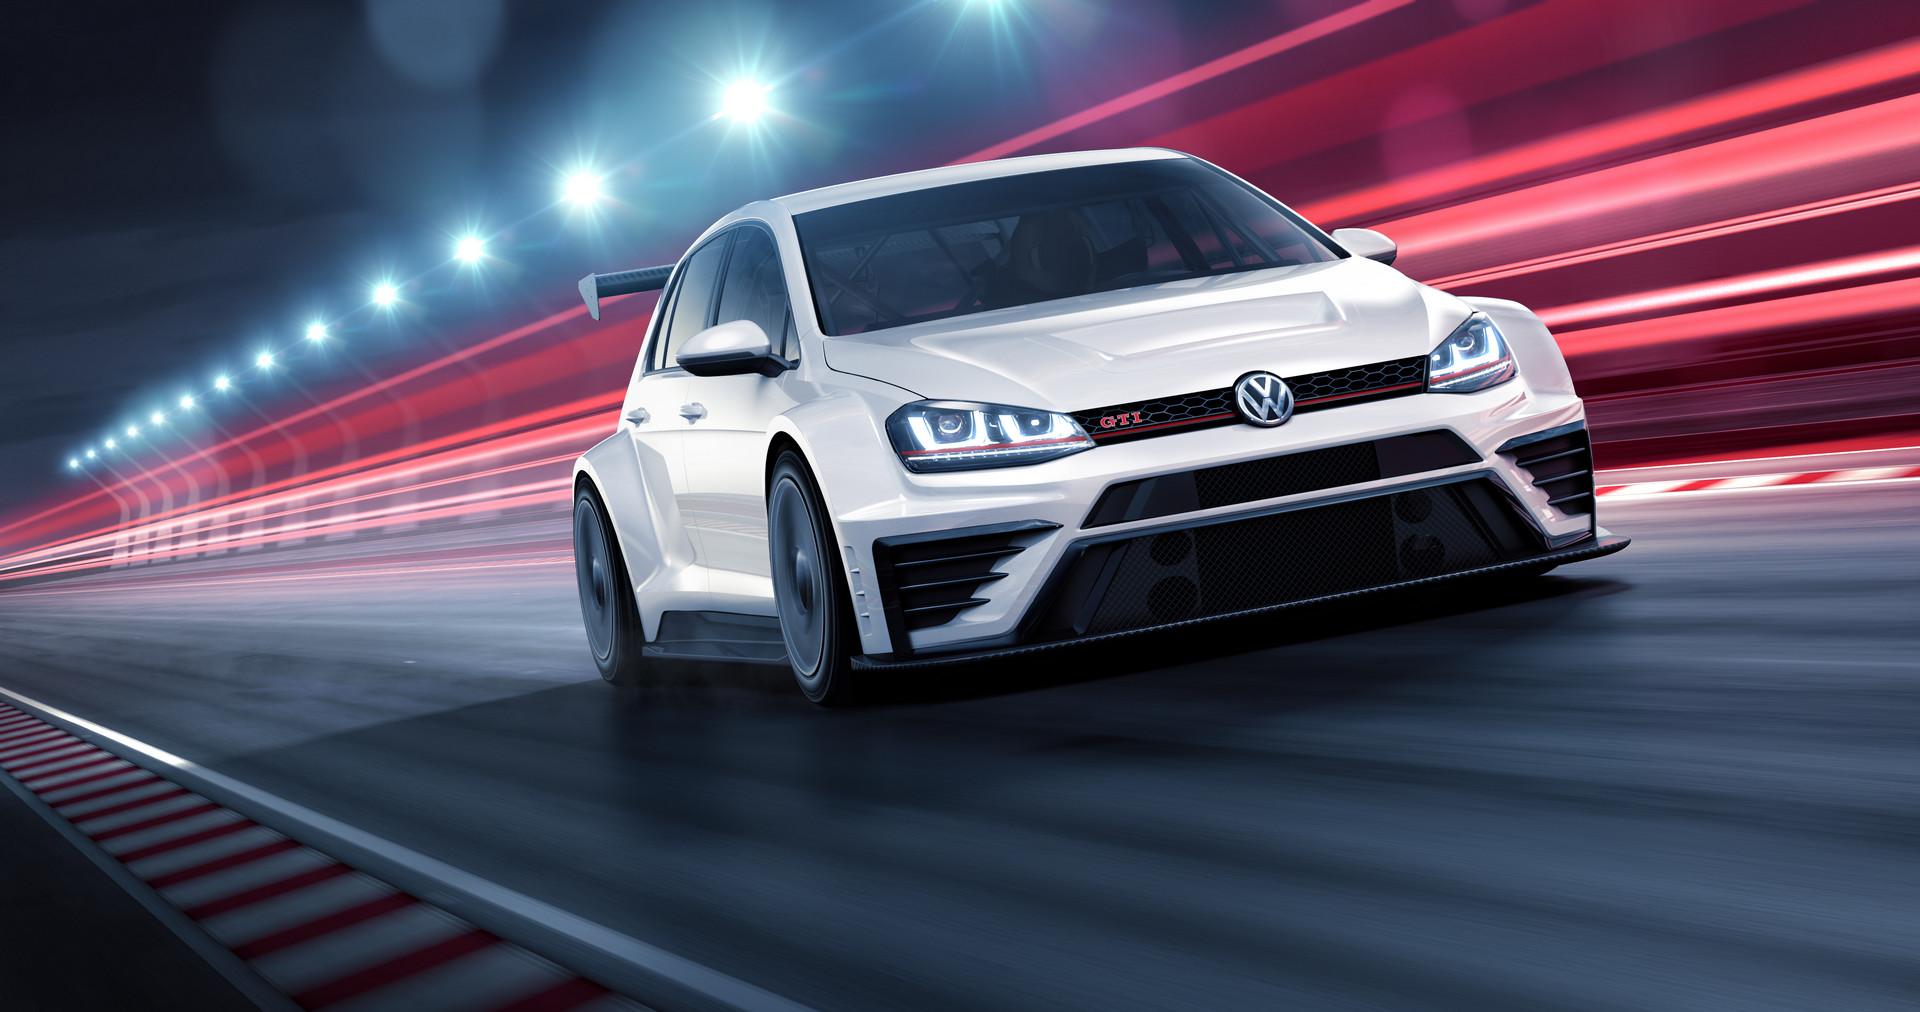 VW GTI TCR Race Car